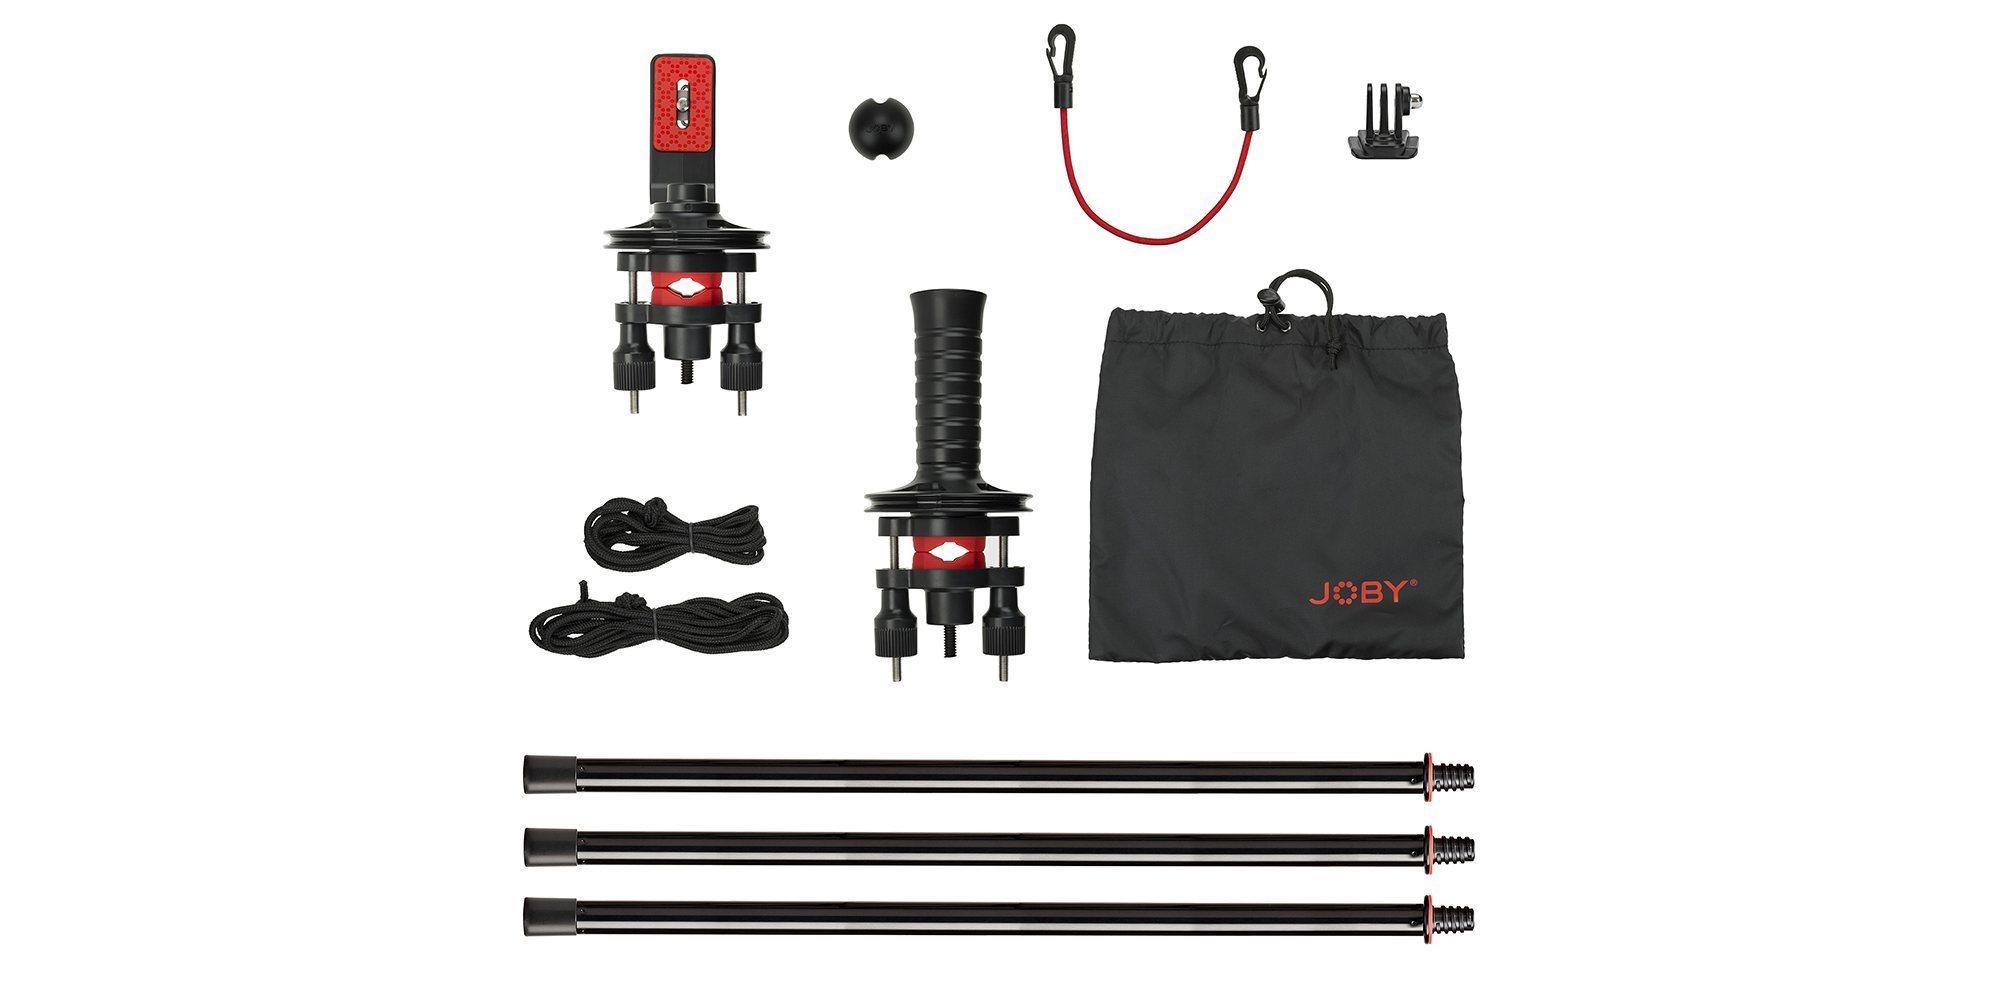 Видеокран-удочка Action Jib Kit & Pole Pack комплектация